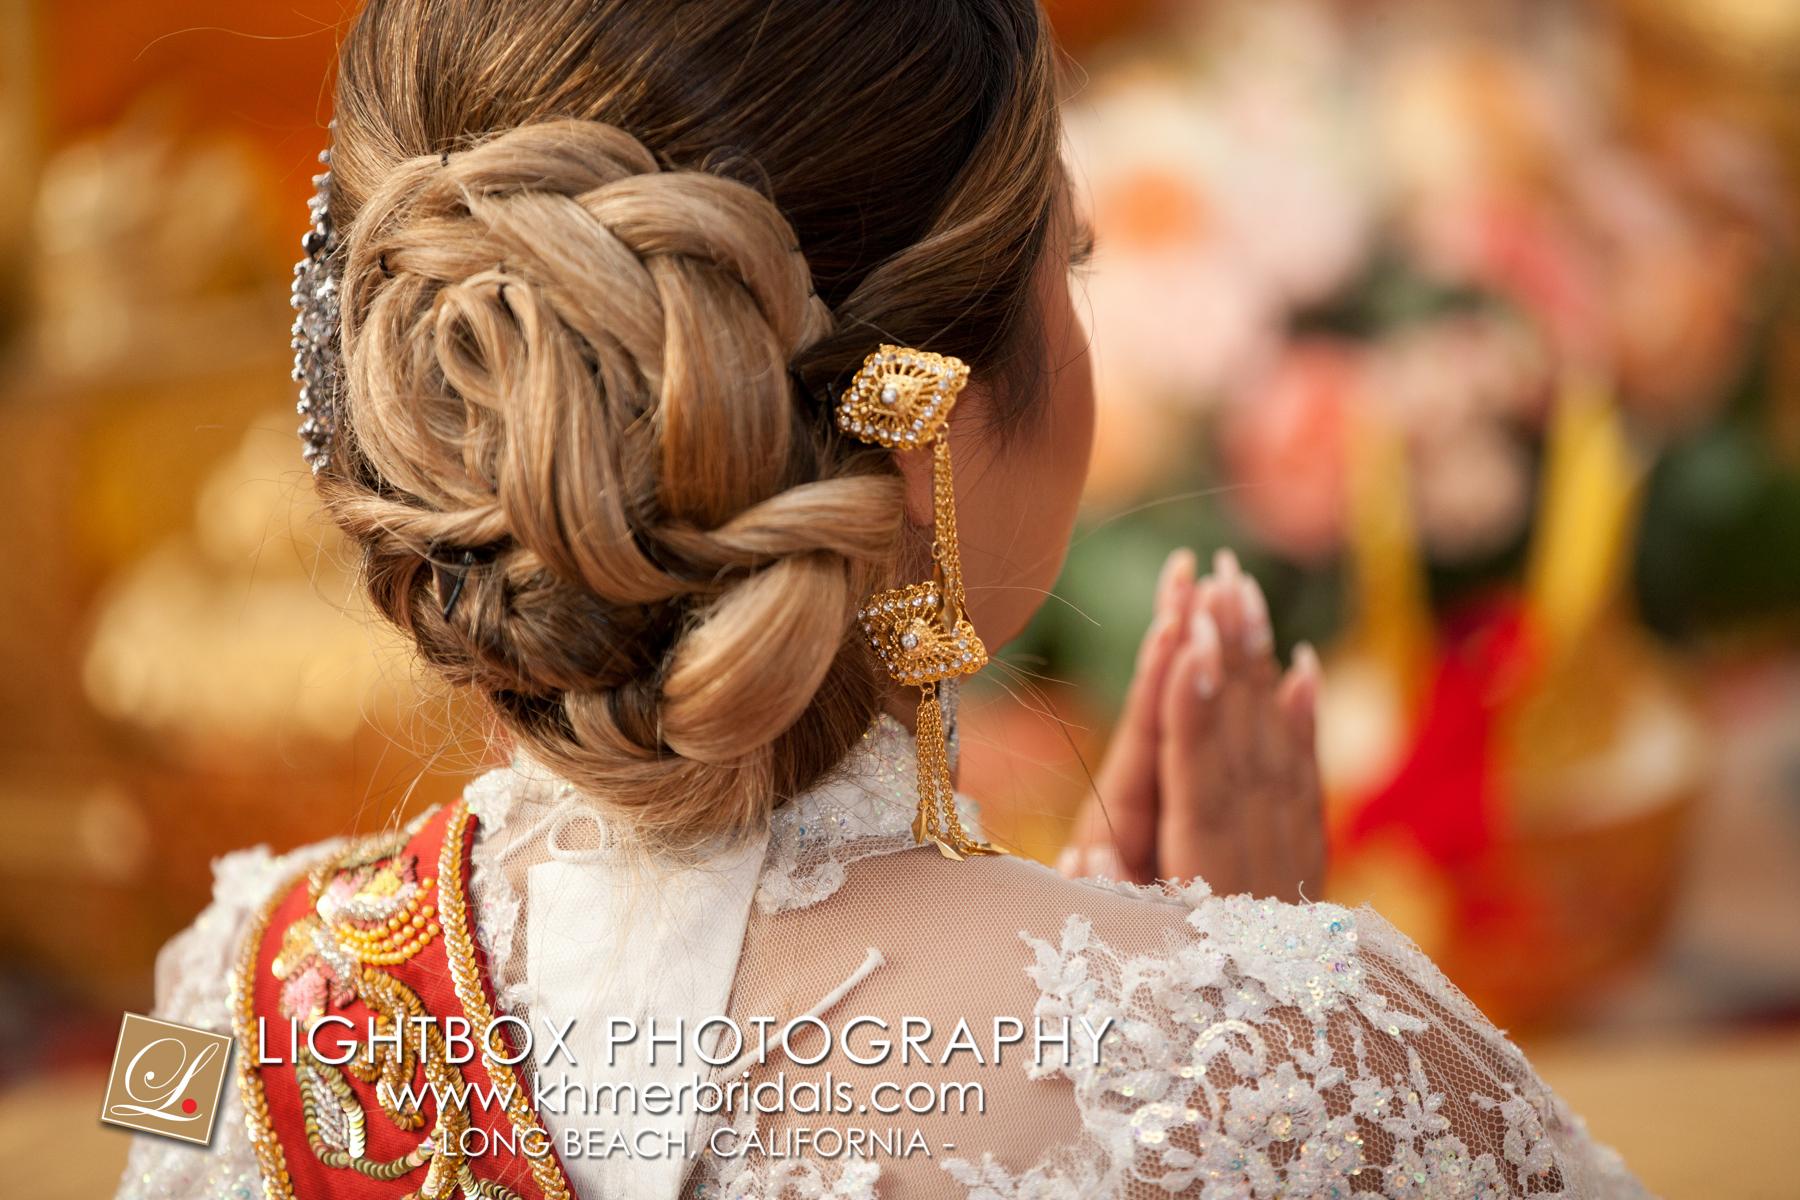 Khmer Bridal Wedding Photography video Apsara Studio Oufit-121.jpg